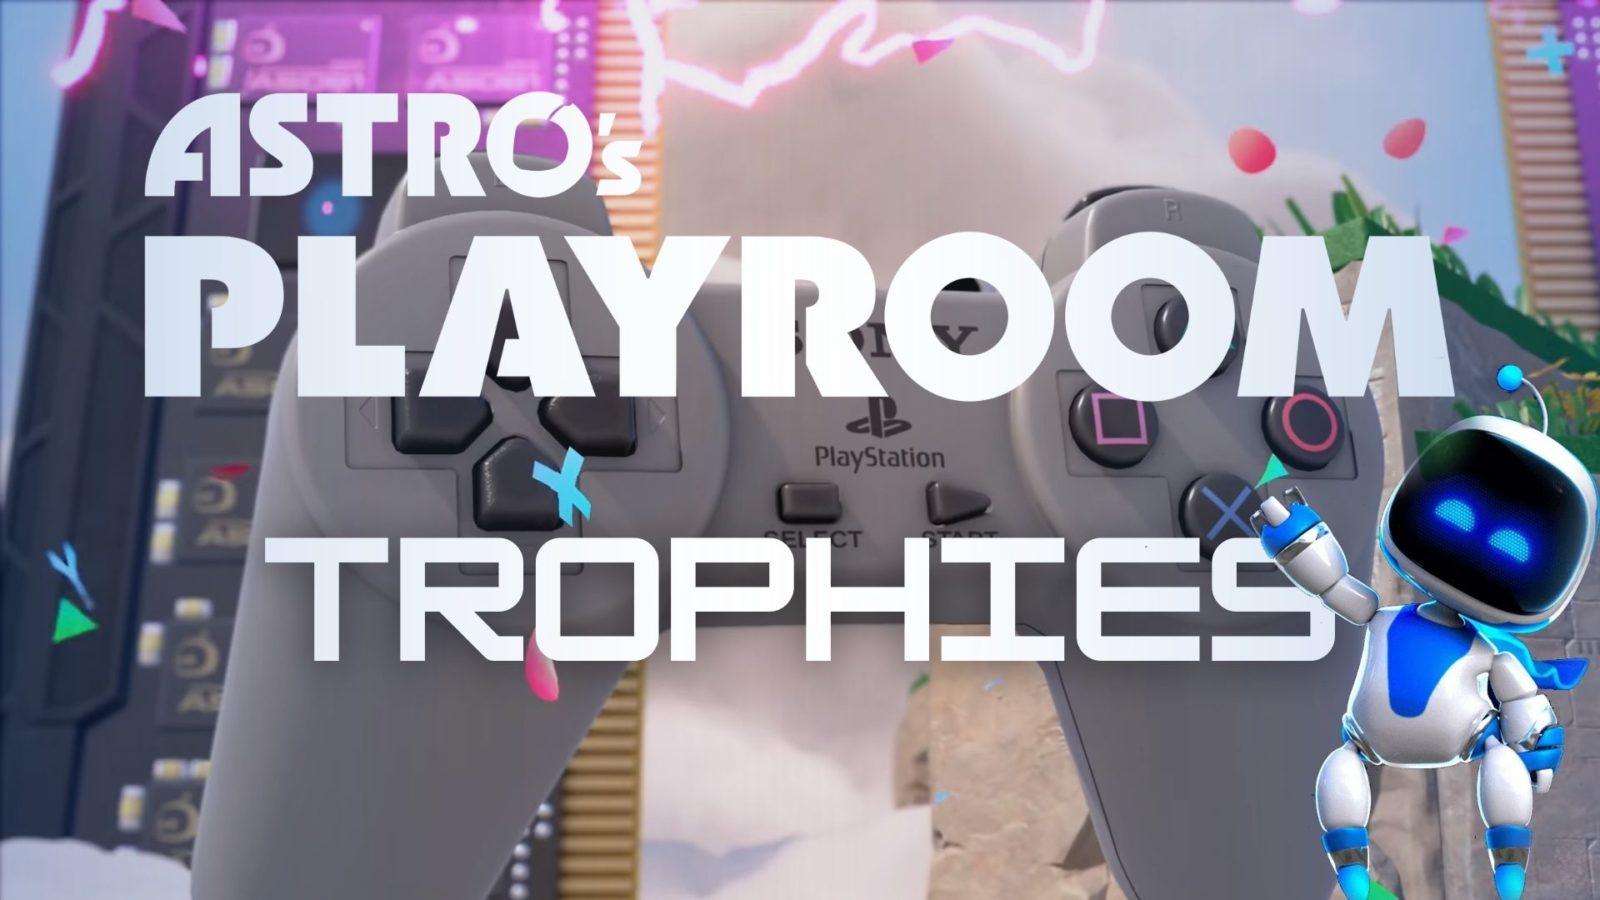 Astros playroom trophies free ps5